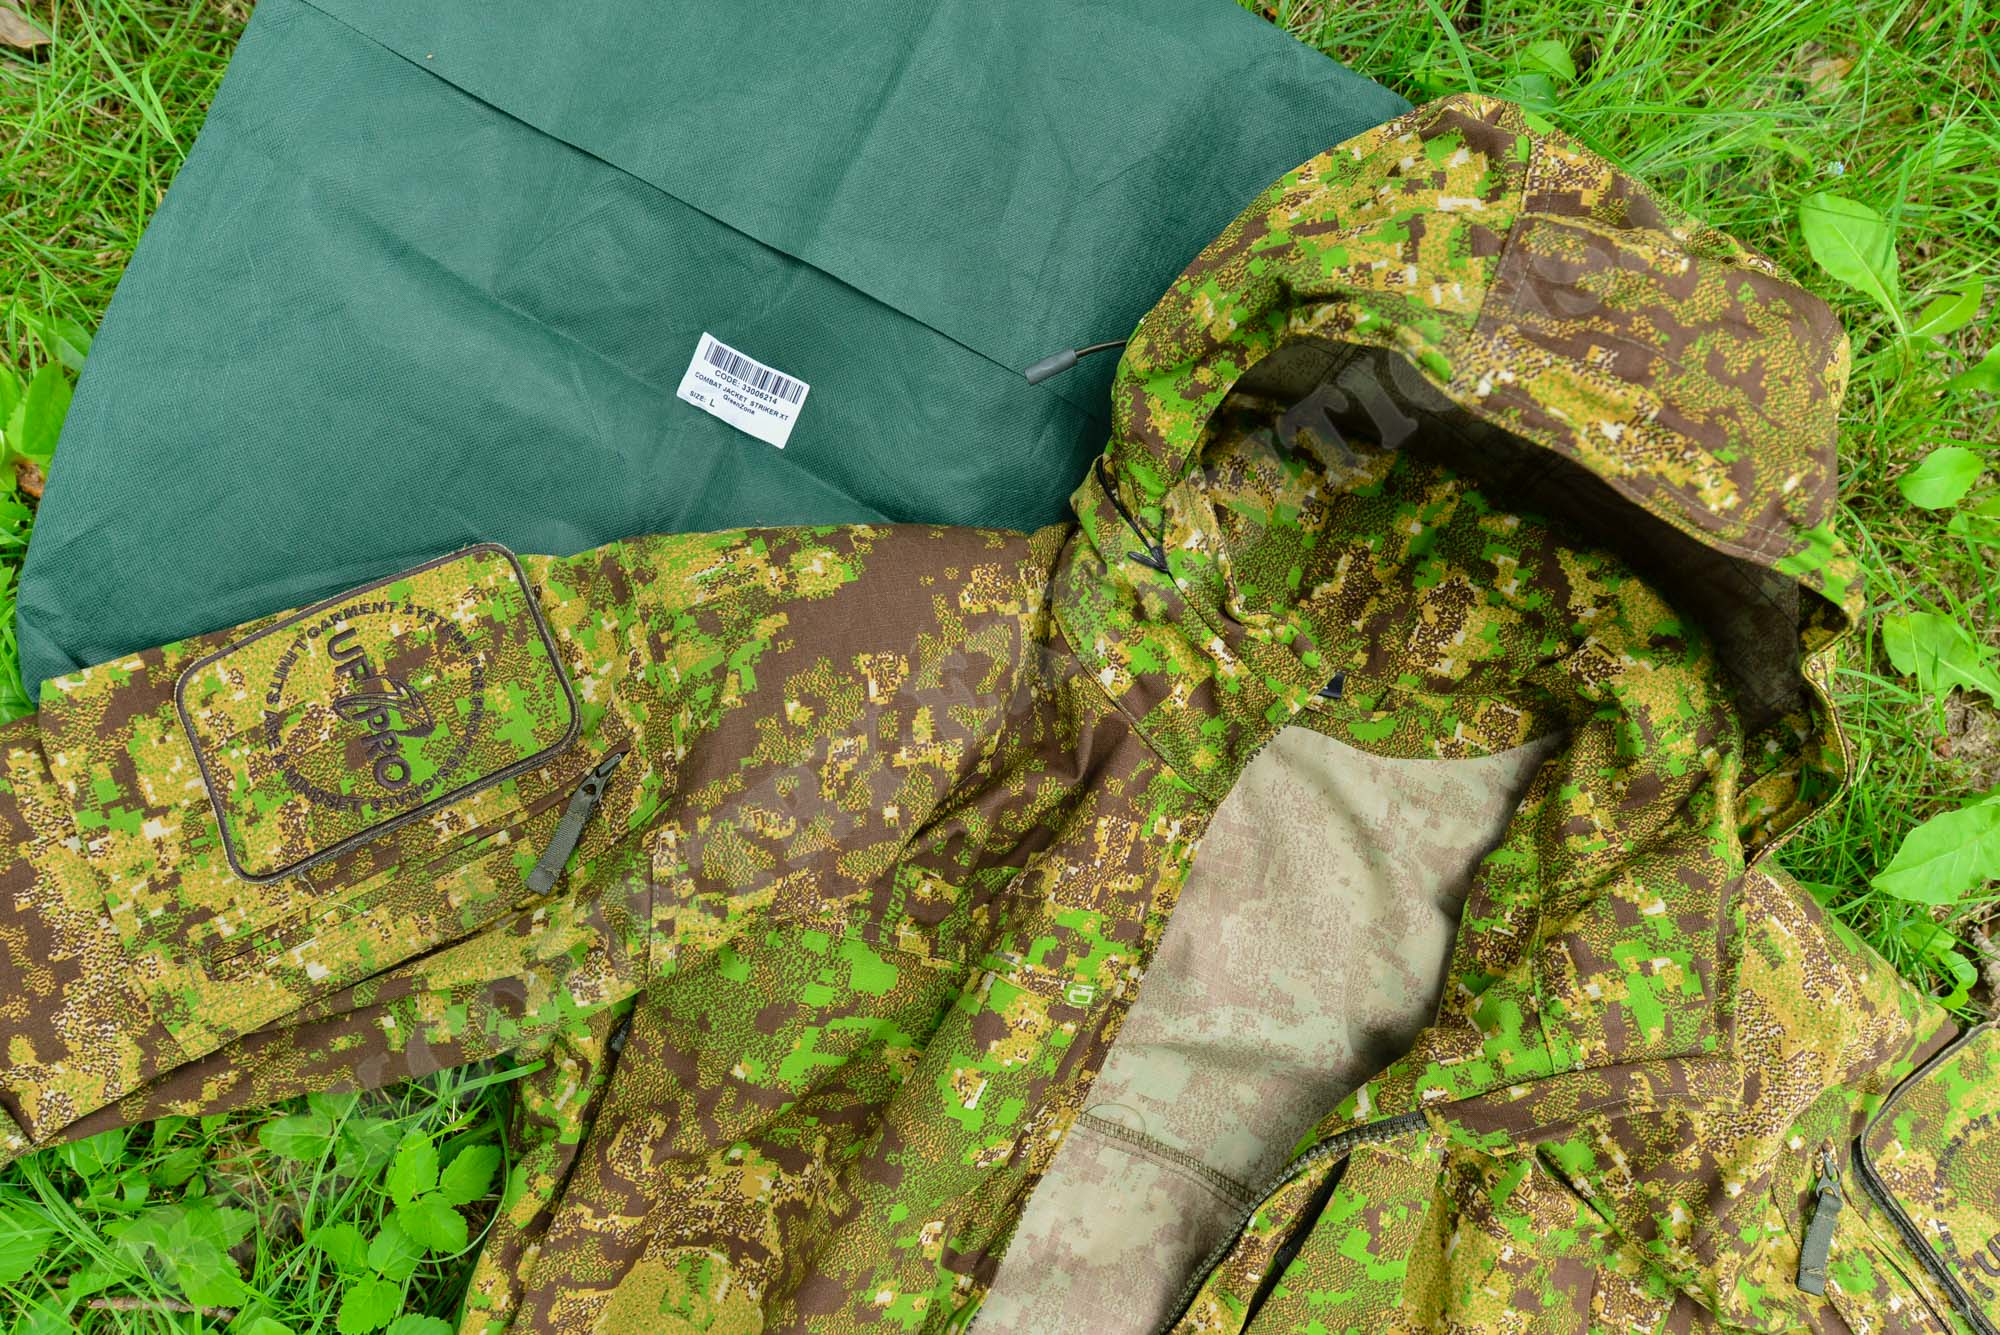 be6913e40 Tactical Wear: UF PRO Striker XT Jacket & Shirt | Backcountry ...